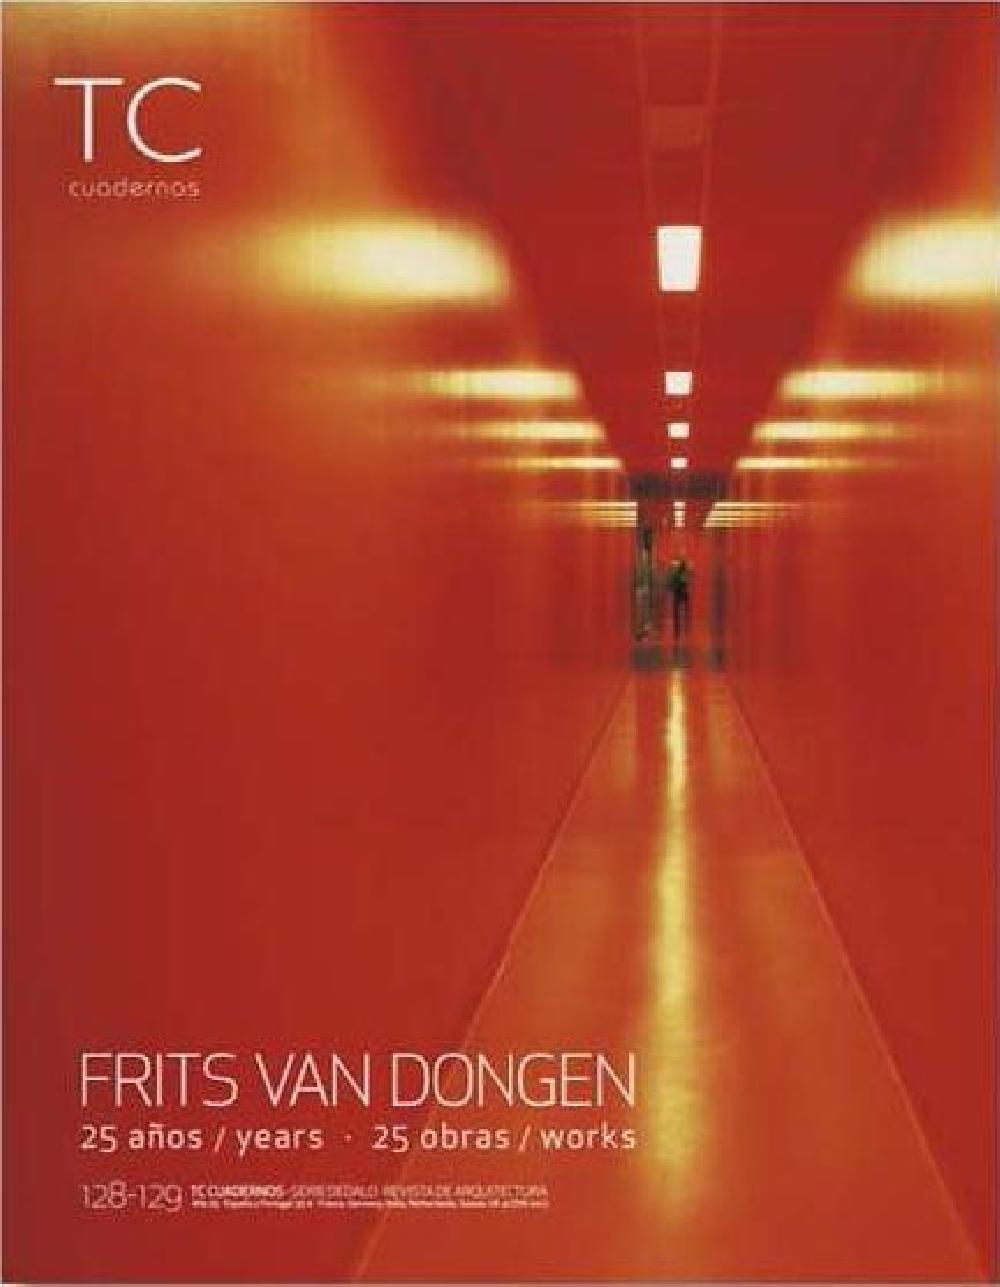 TC cuadernos 128/129 FRITS VAN DONGEN 25 years/anos 25 works/obras